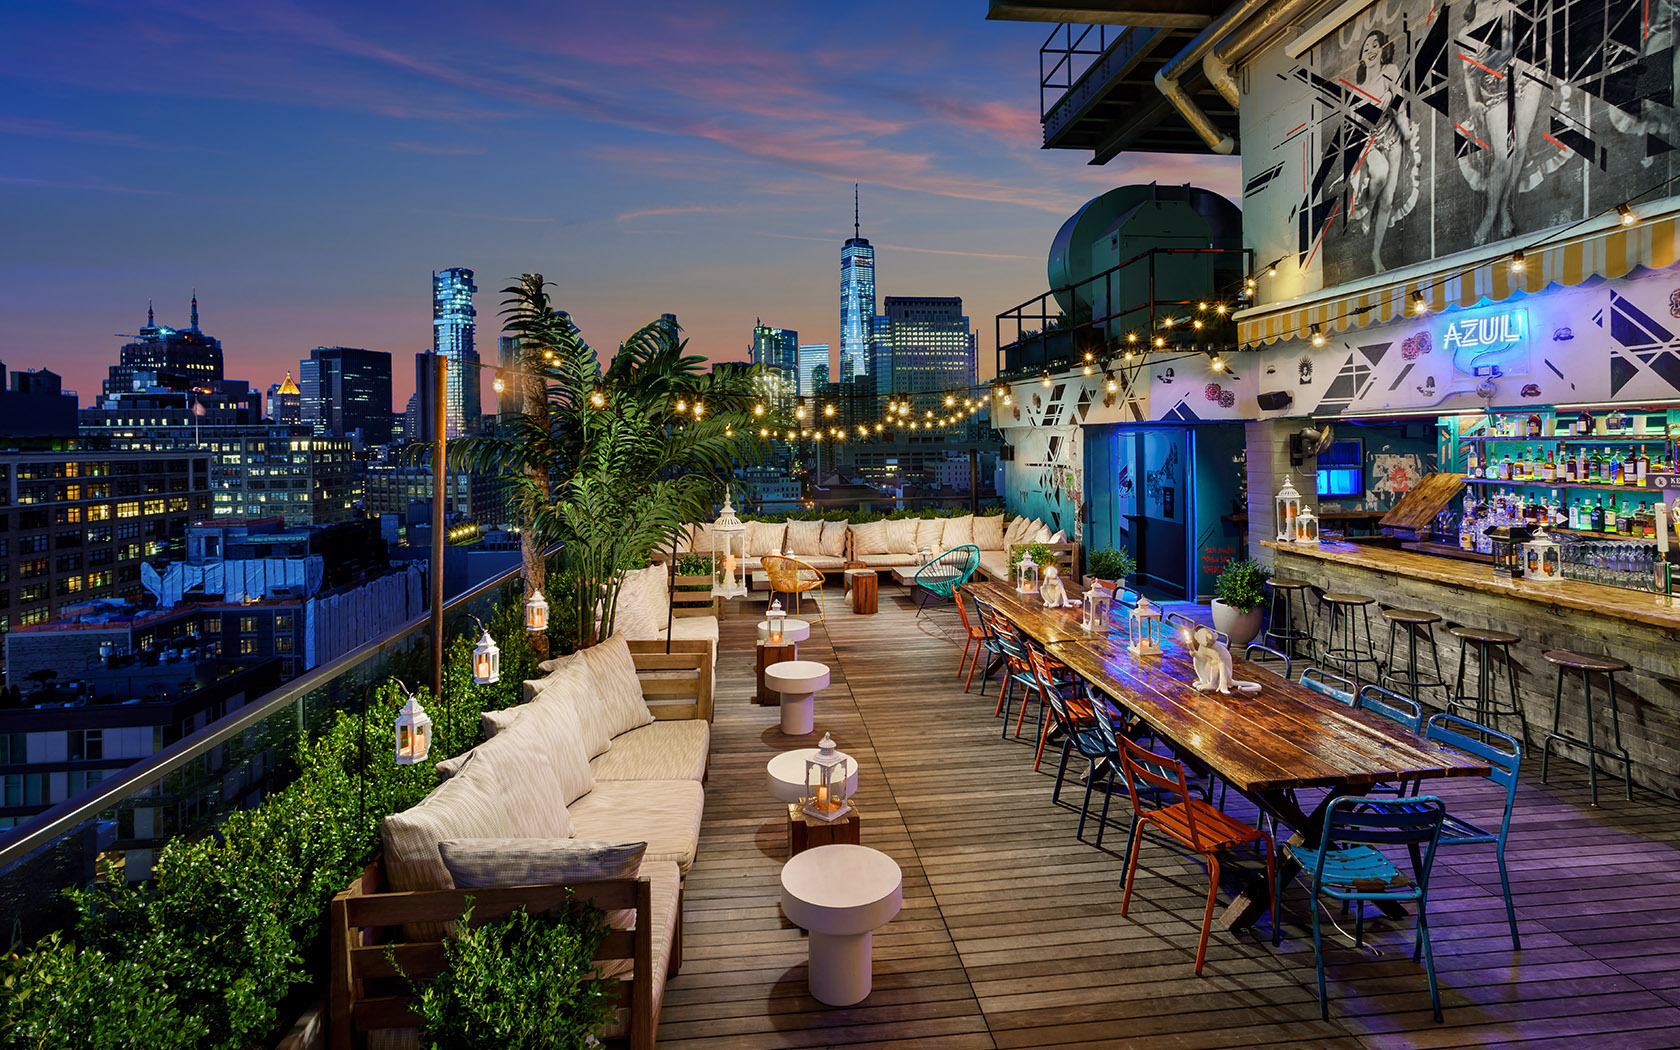 Azul-new-york-soho-hotel-hugo-best-bars-pineapple-princess